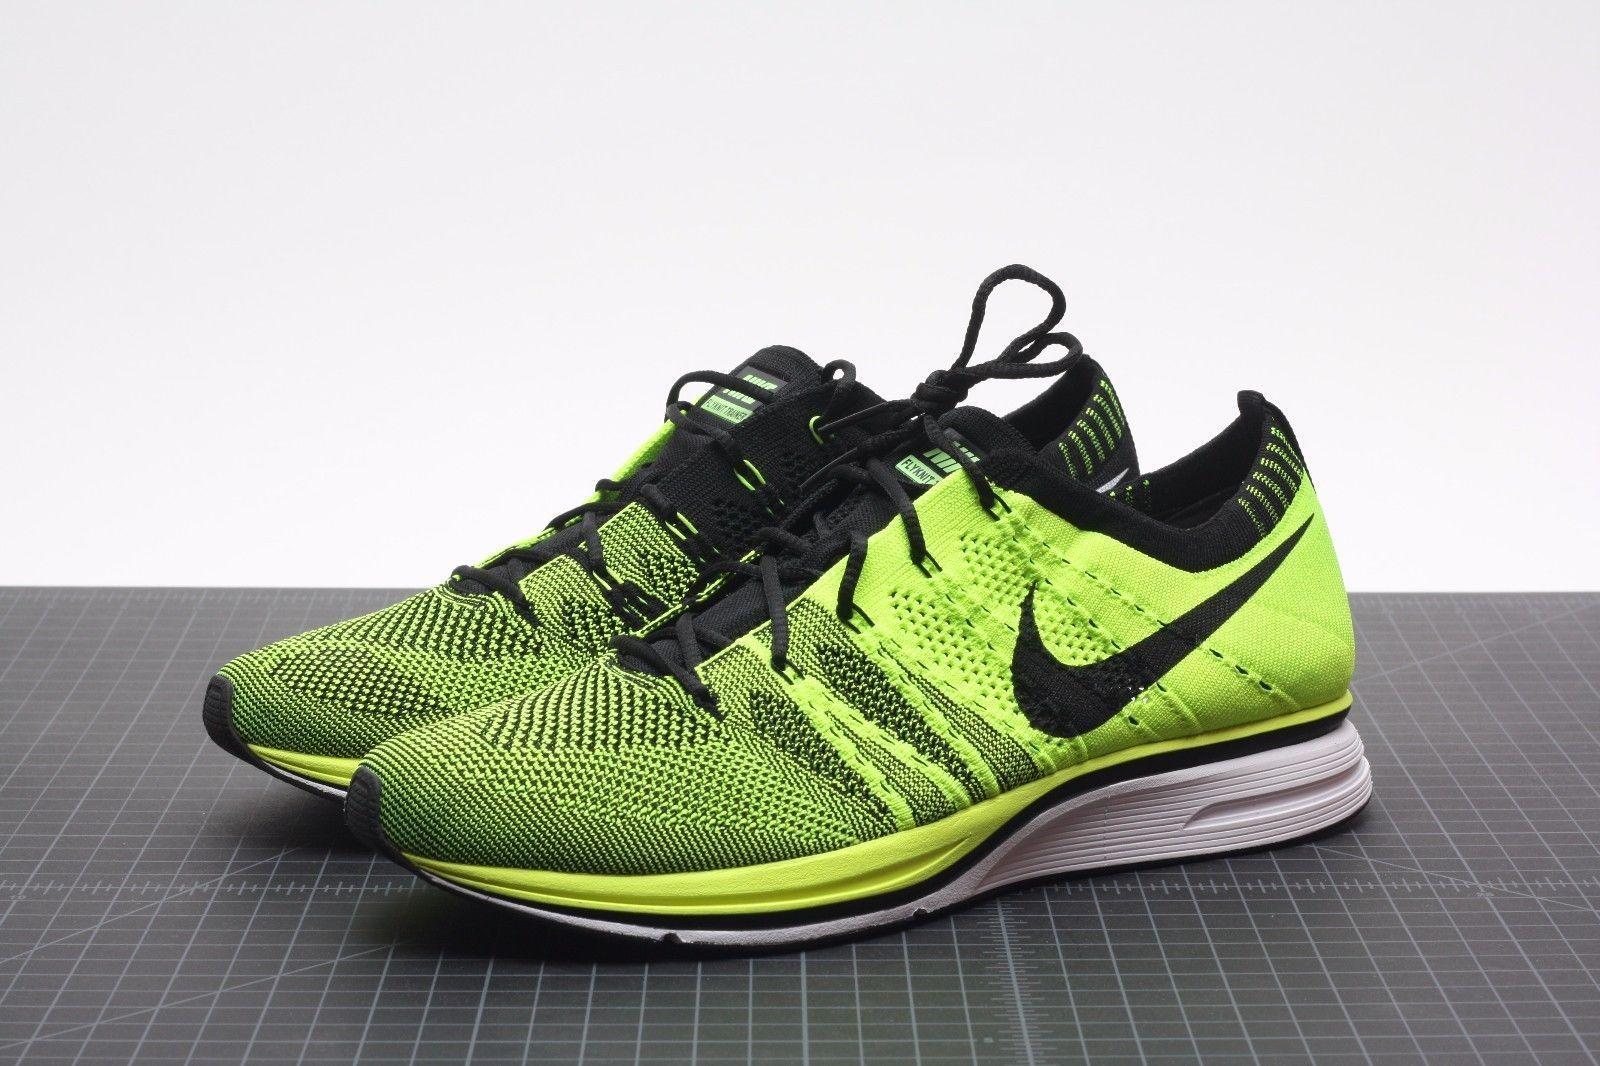 2012 Nike Flyknit Trainer Racer Volt Black Unpadded Olympics 532984-700  size 6.